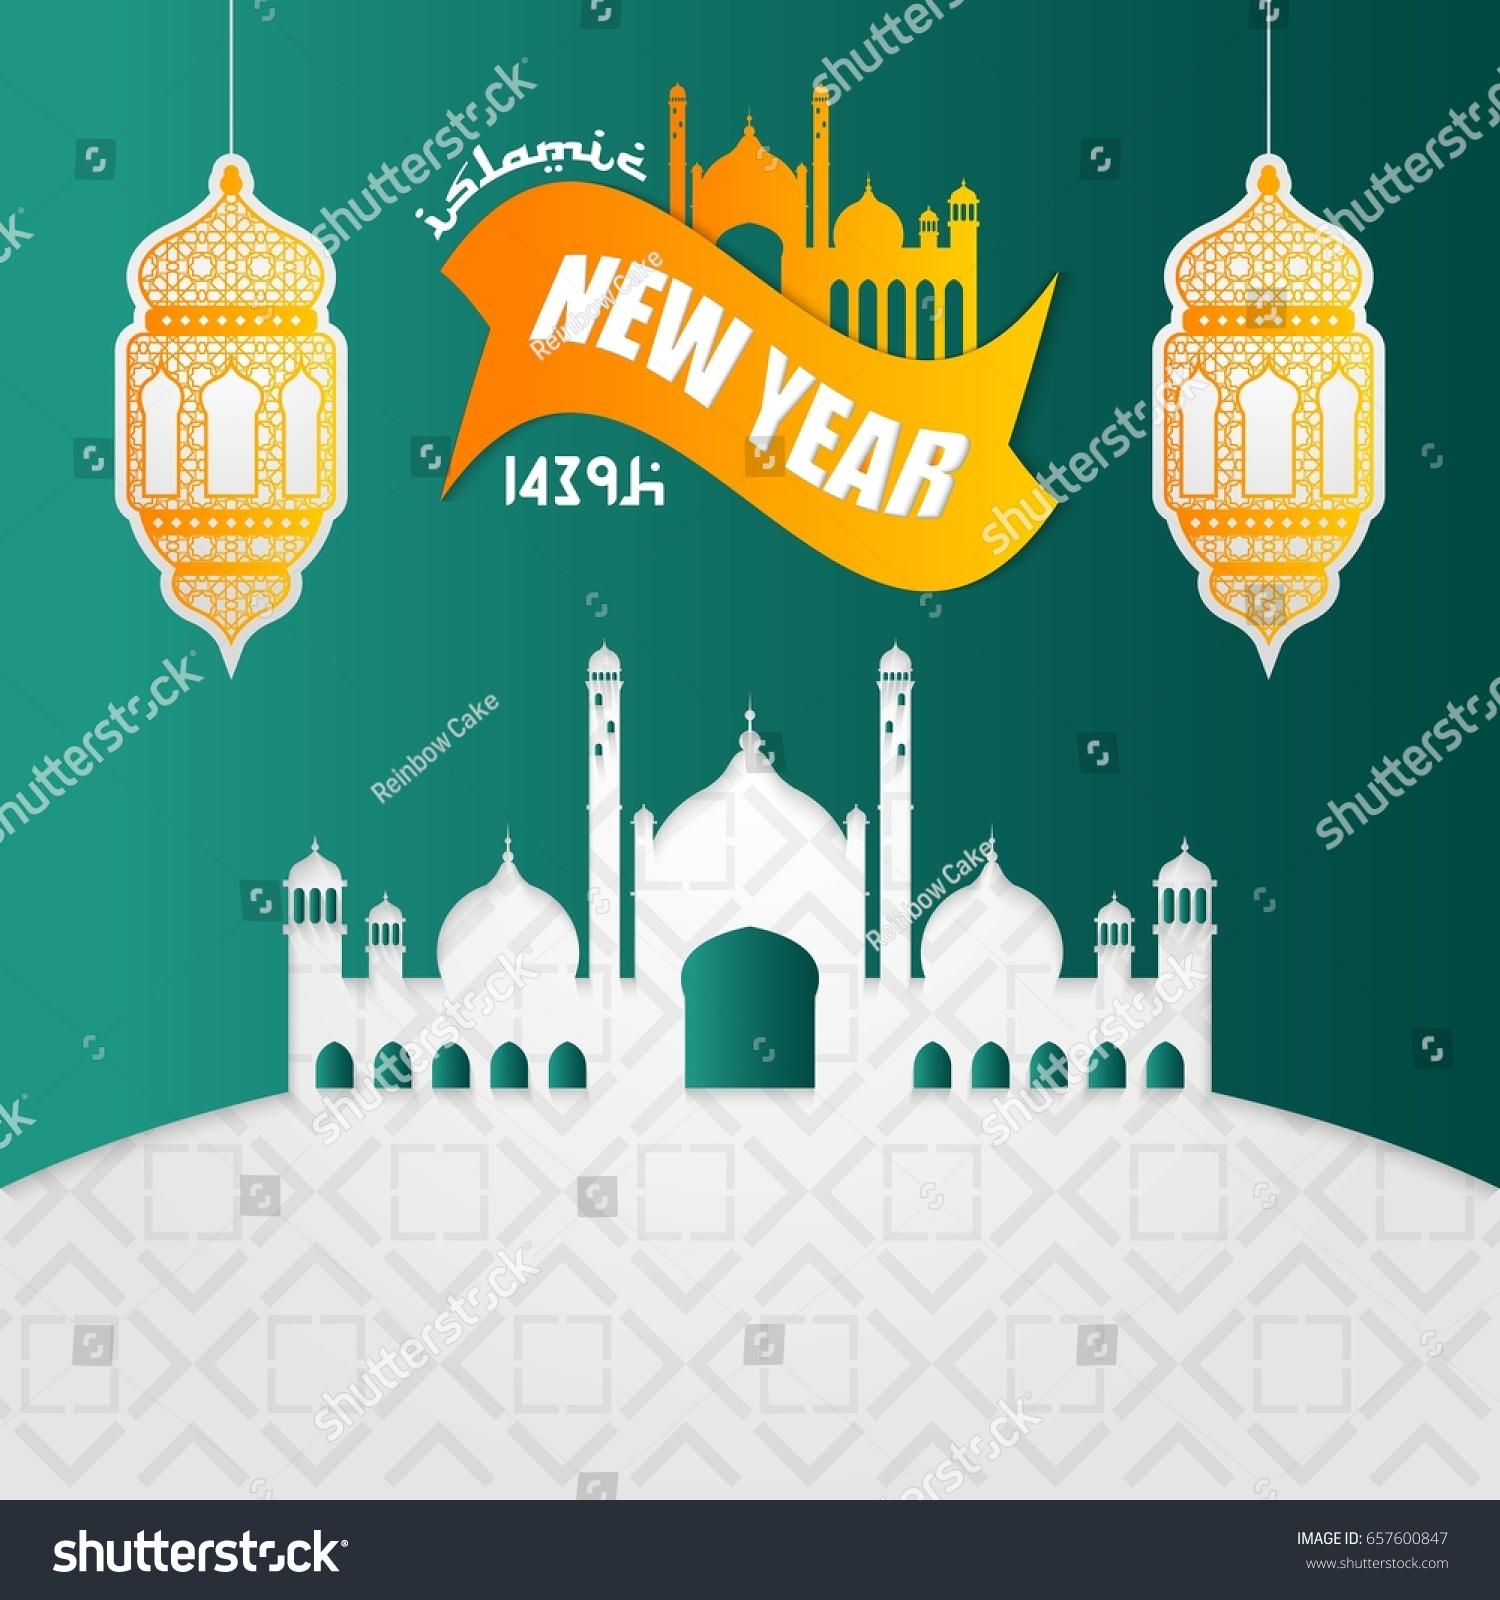 Happy New Hijri Year 1439, Happy New Year for all Muslim Community. Islamic  New